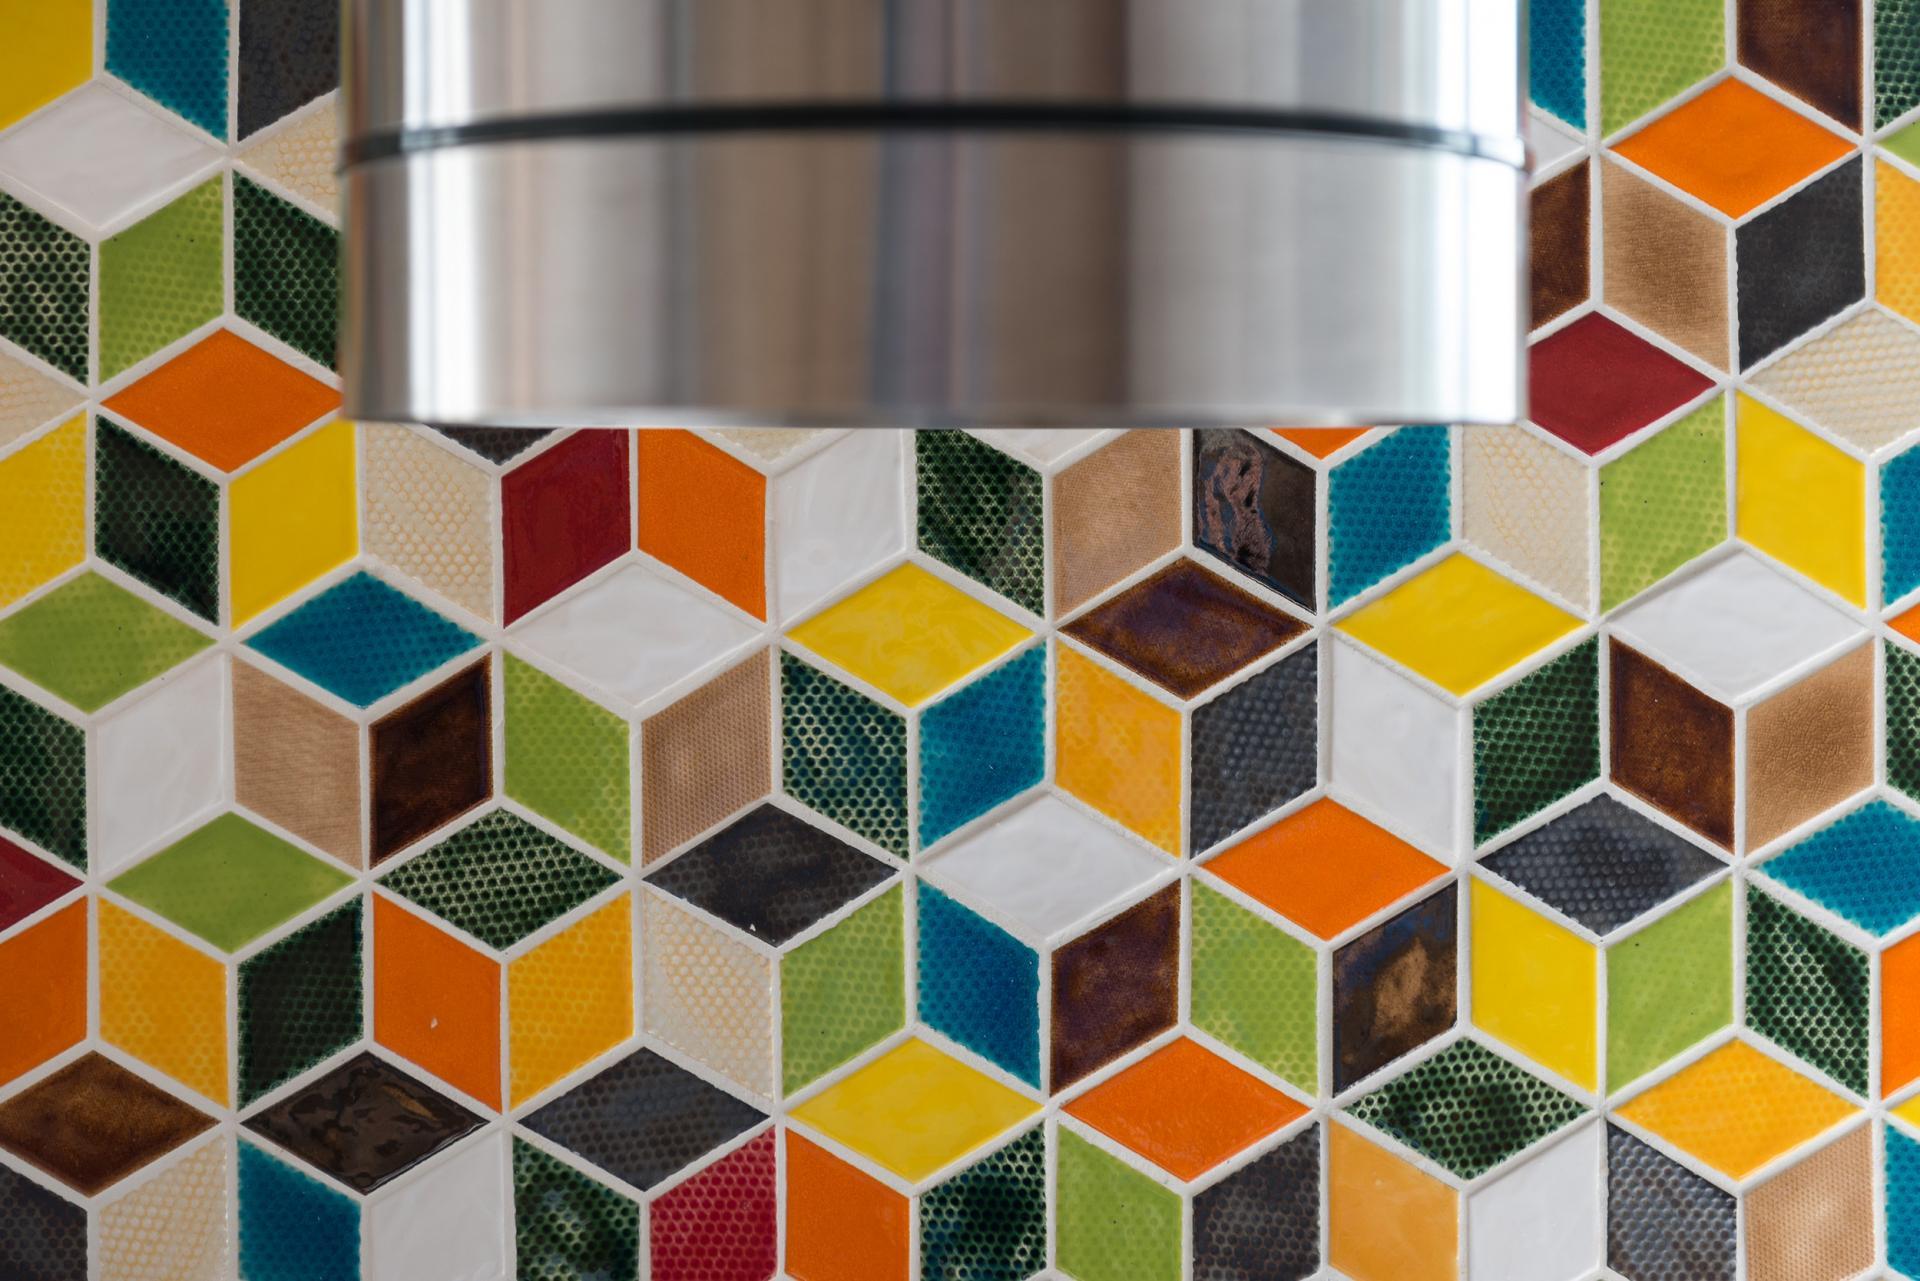 - Multicolor-backsplash Interior Design Ideas.